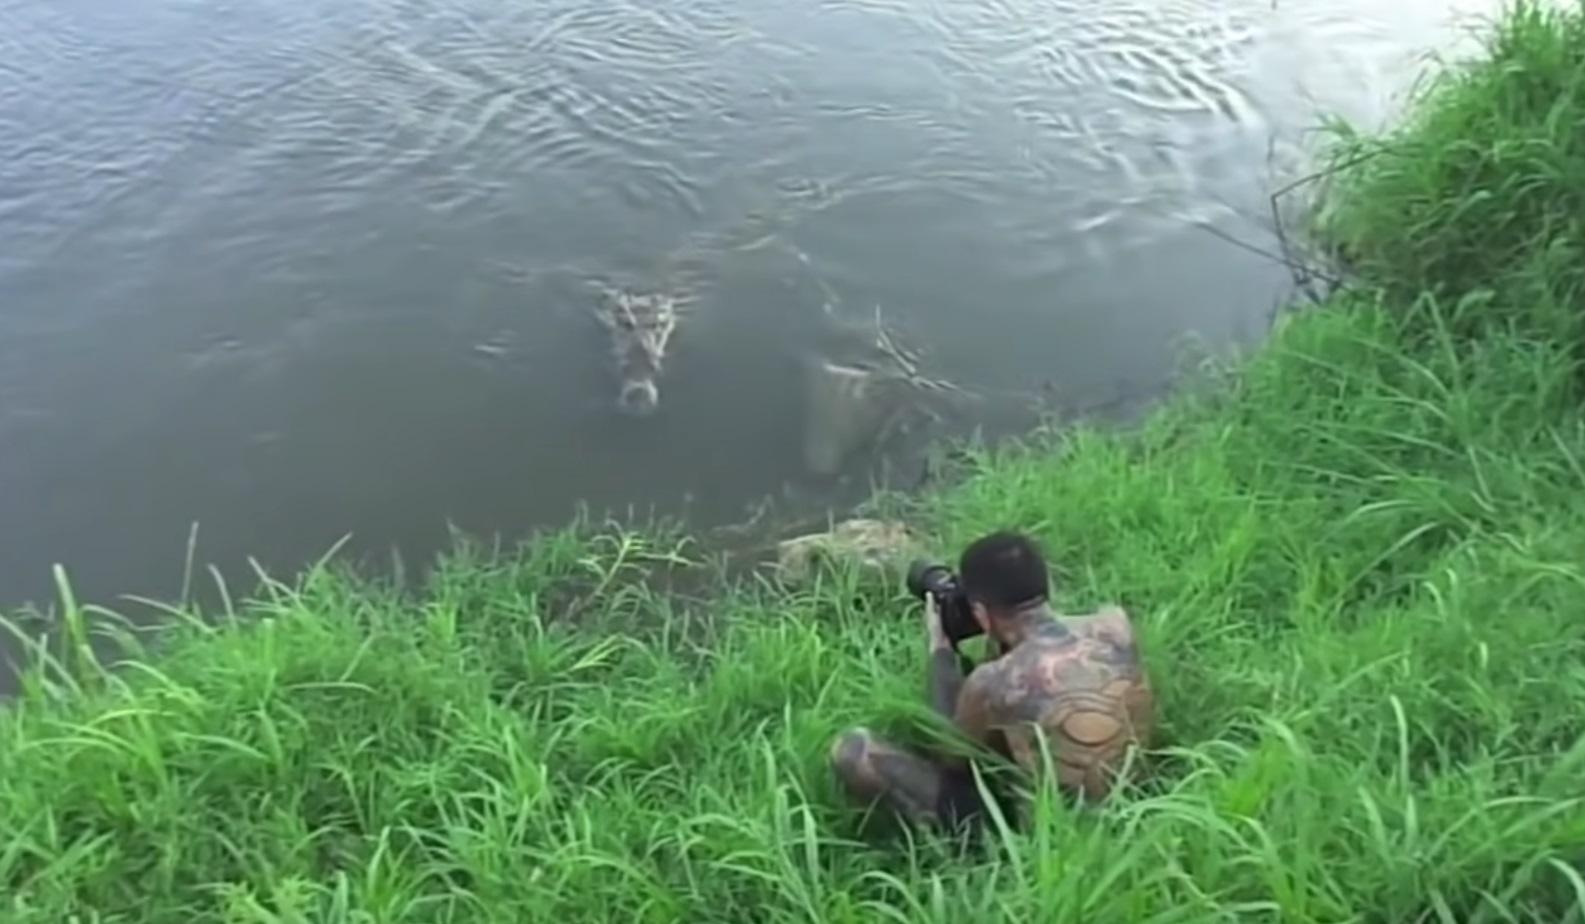 Photographer Gets Too Close To Crocodiles